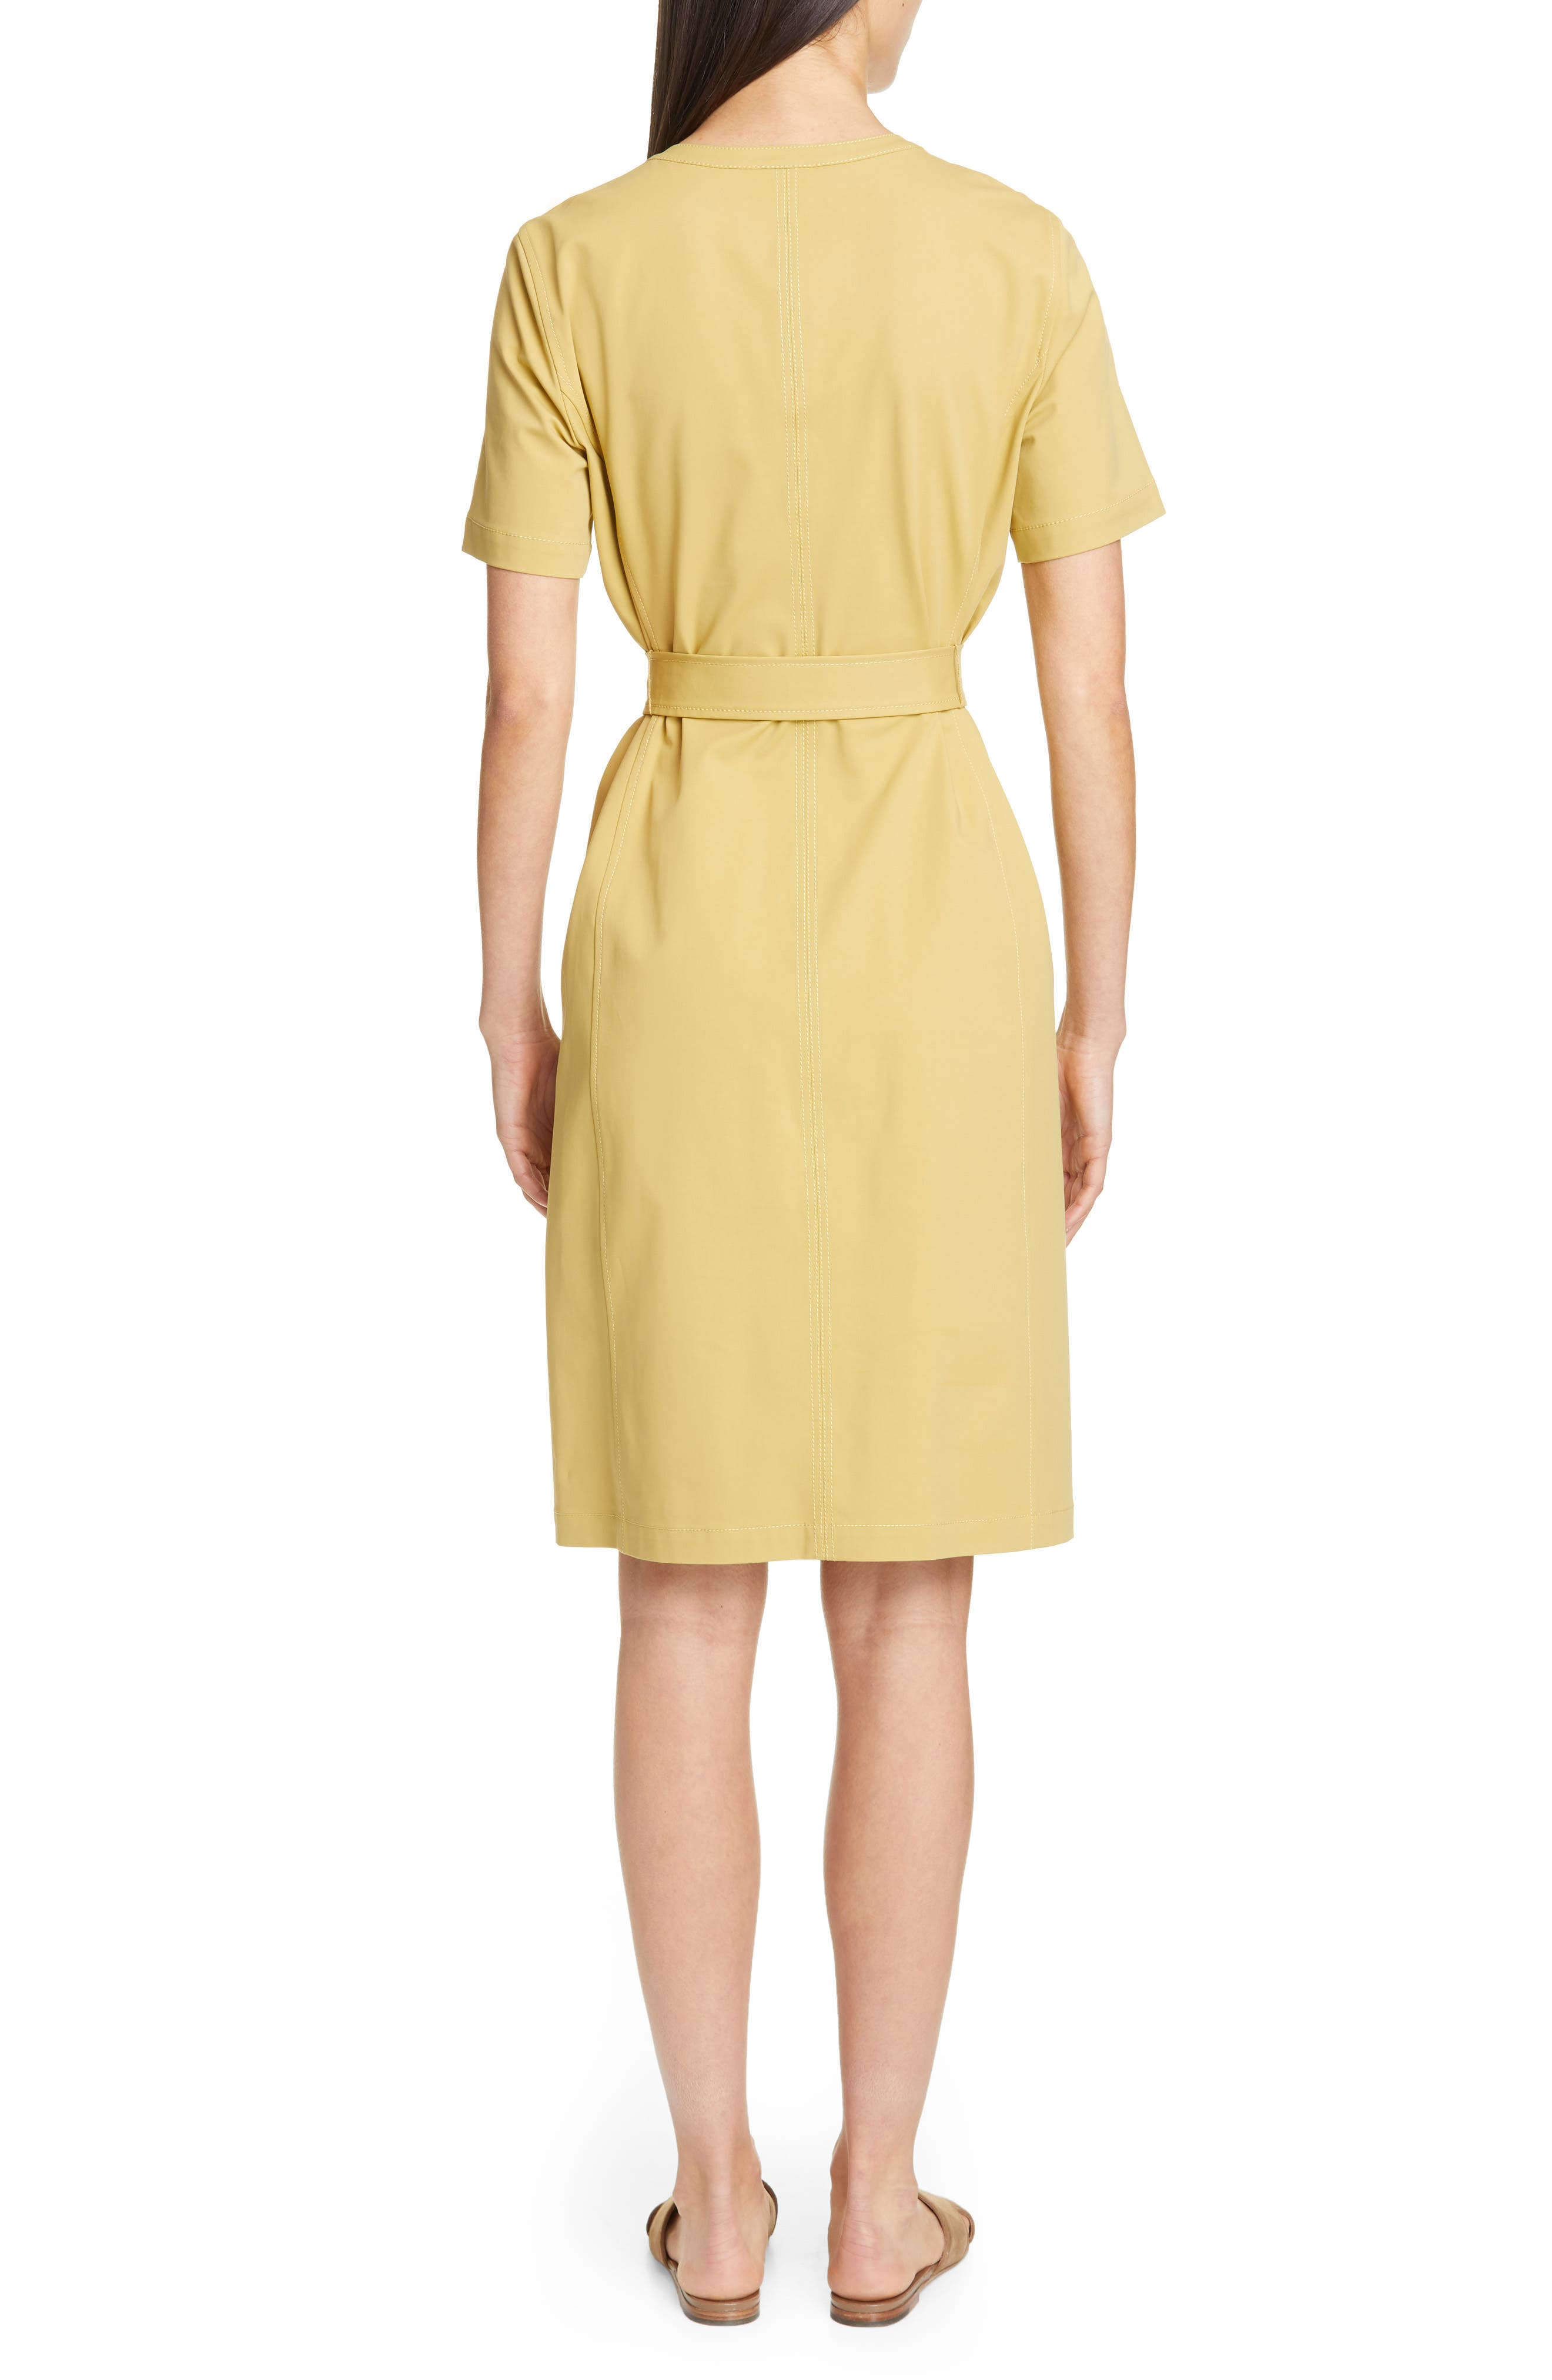 LAFAYETTE 148 NEW YORK, Elizabella Belted Dress, Alternate thumbnail 2, color, GREEN TEA